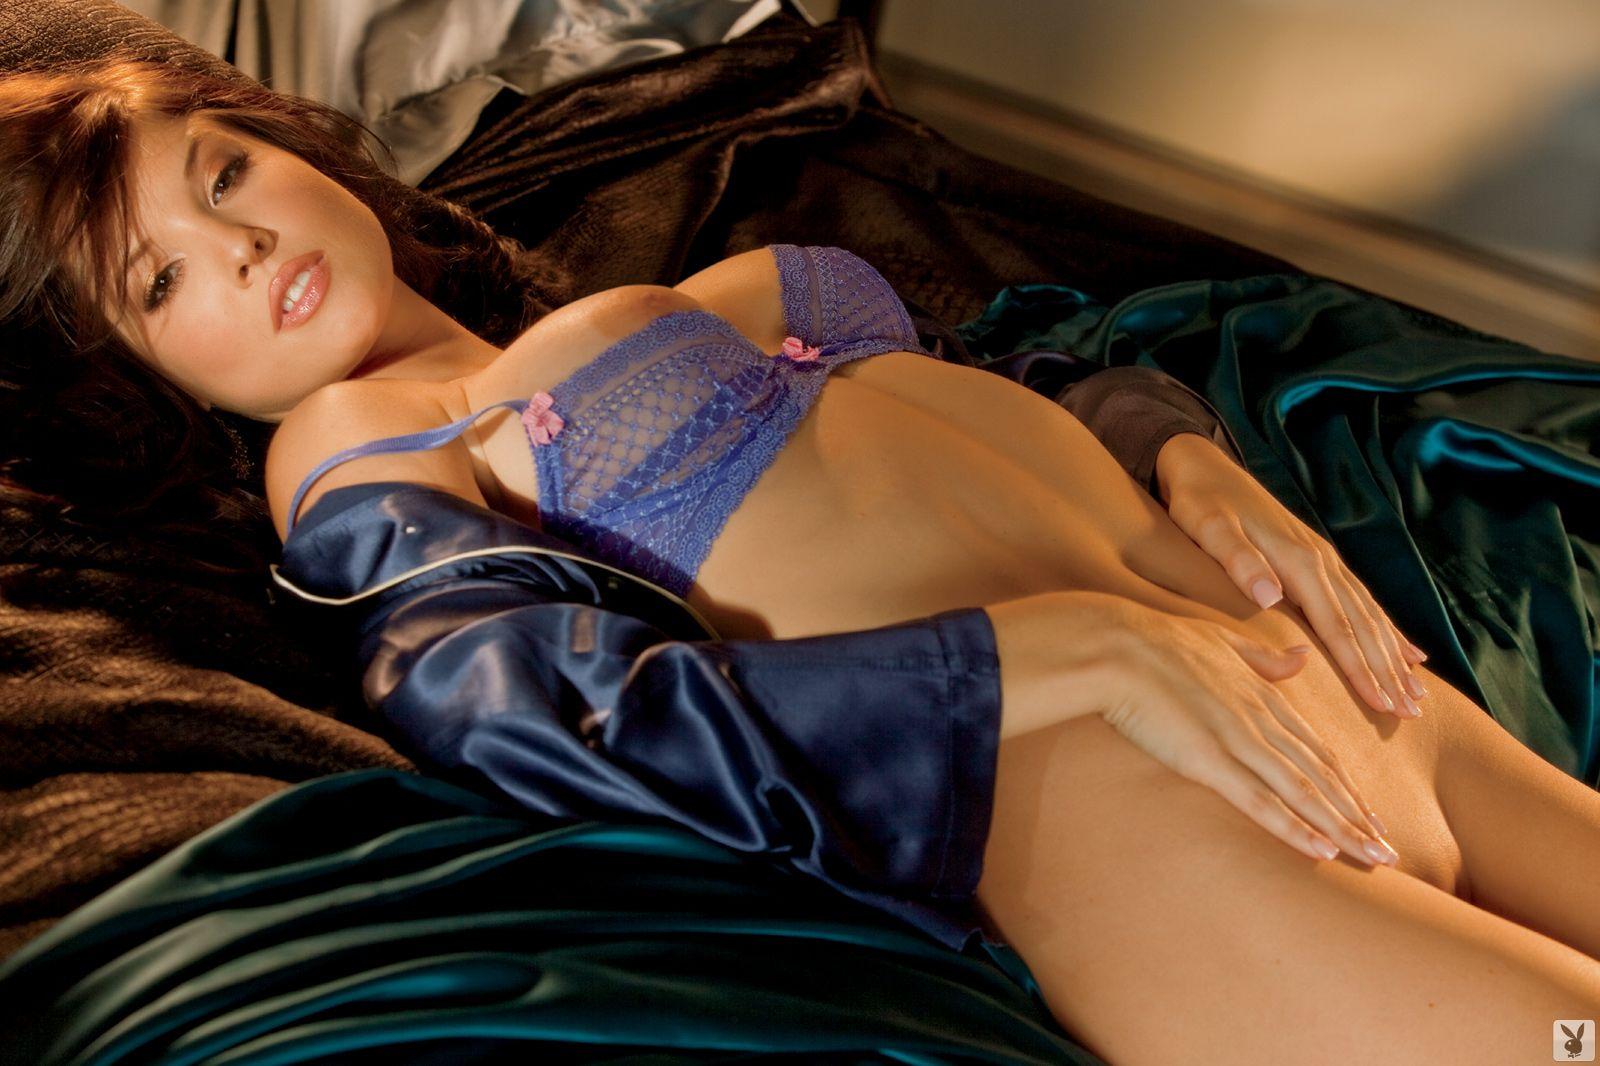 amanda cerny naked – #thefappening